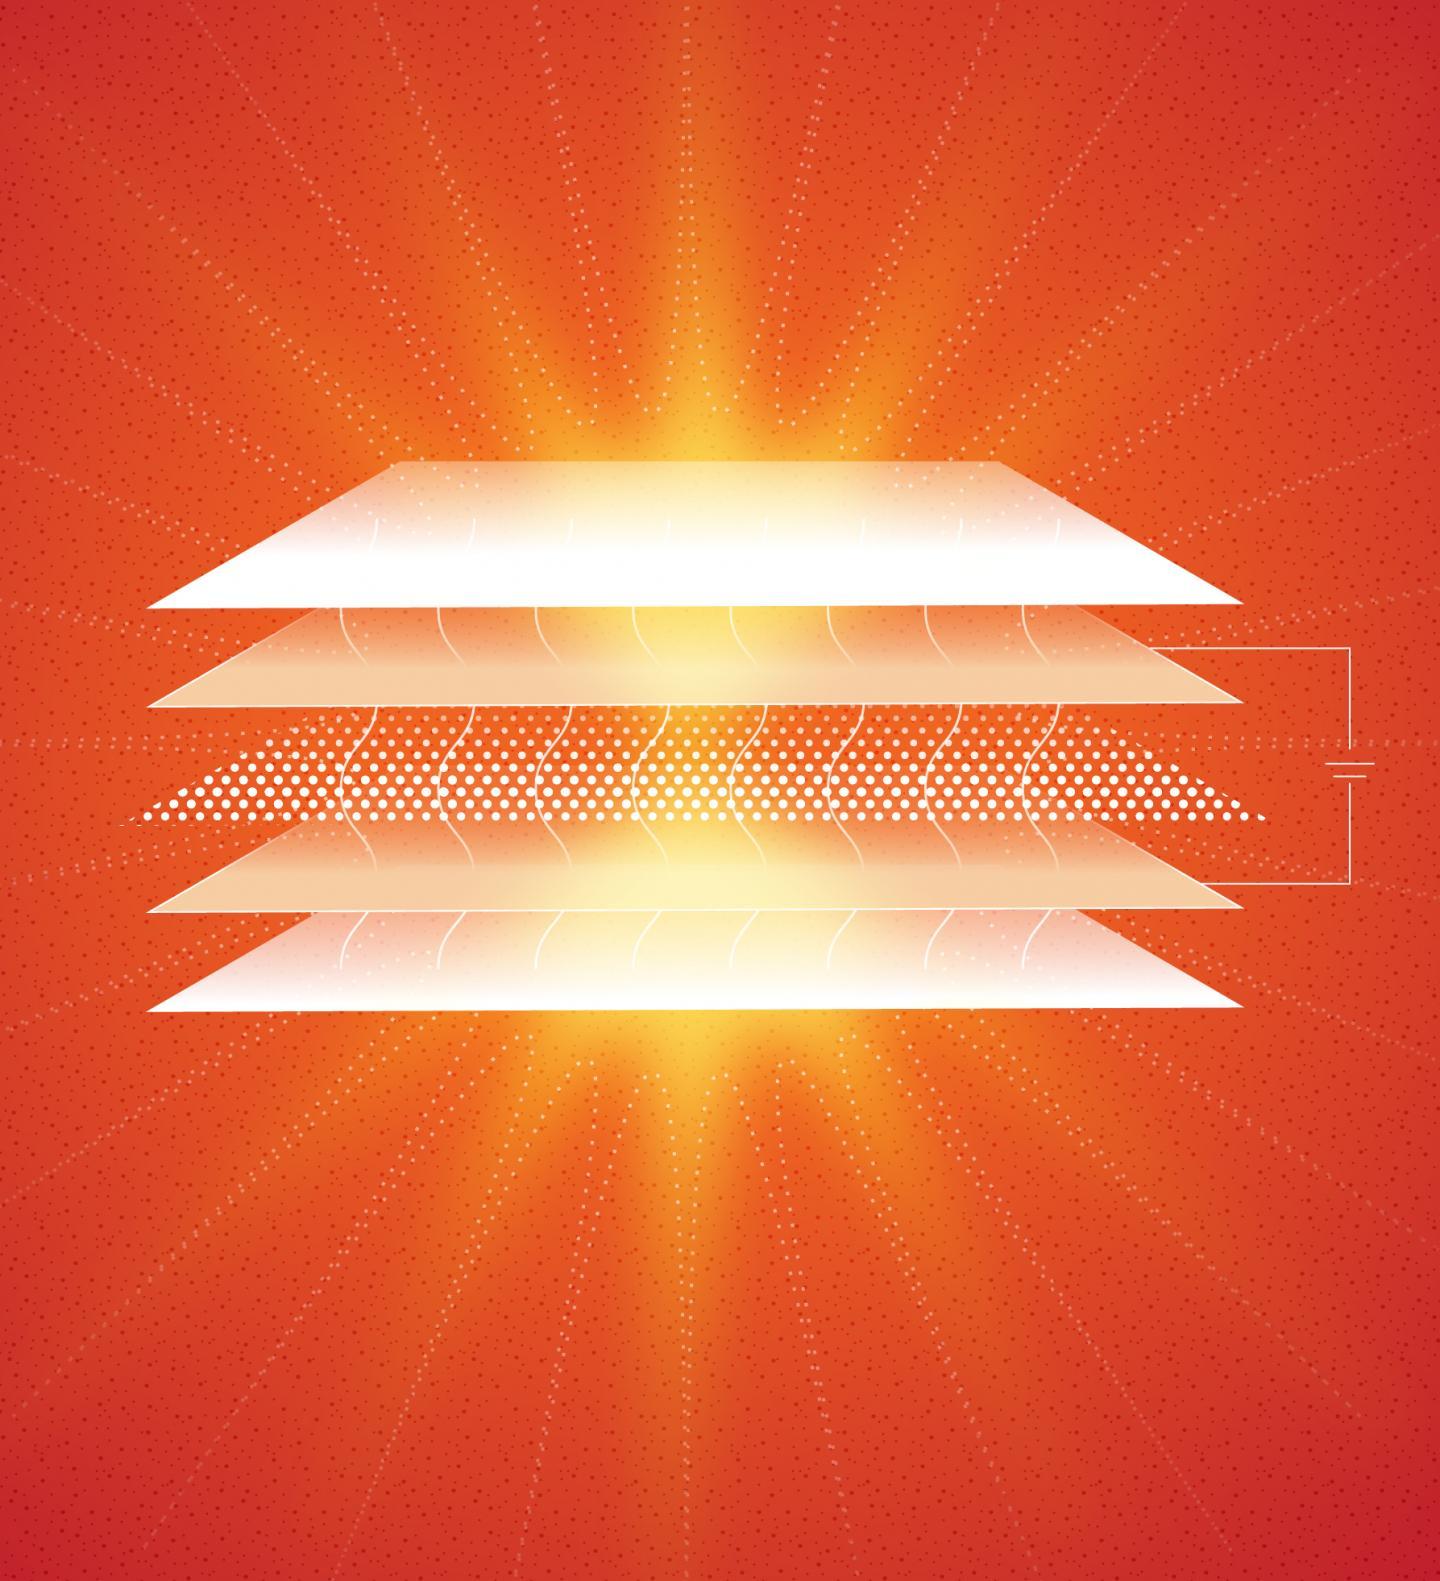 Half-Light- Half-Matter Quasiparticle Based LED